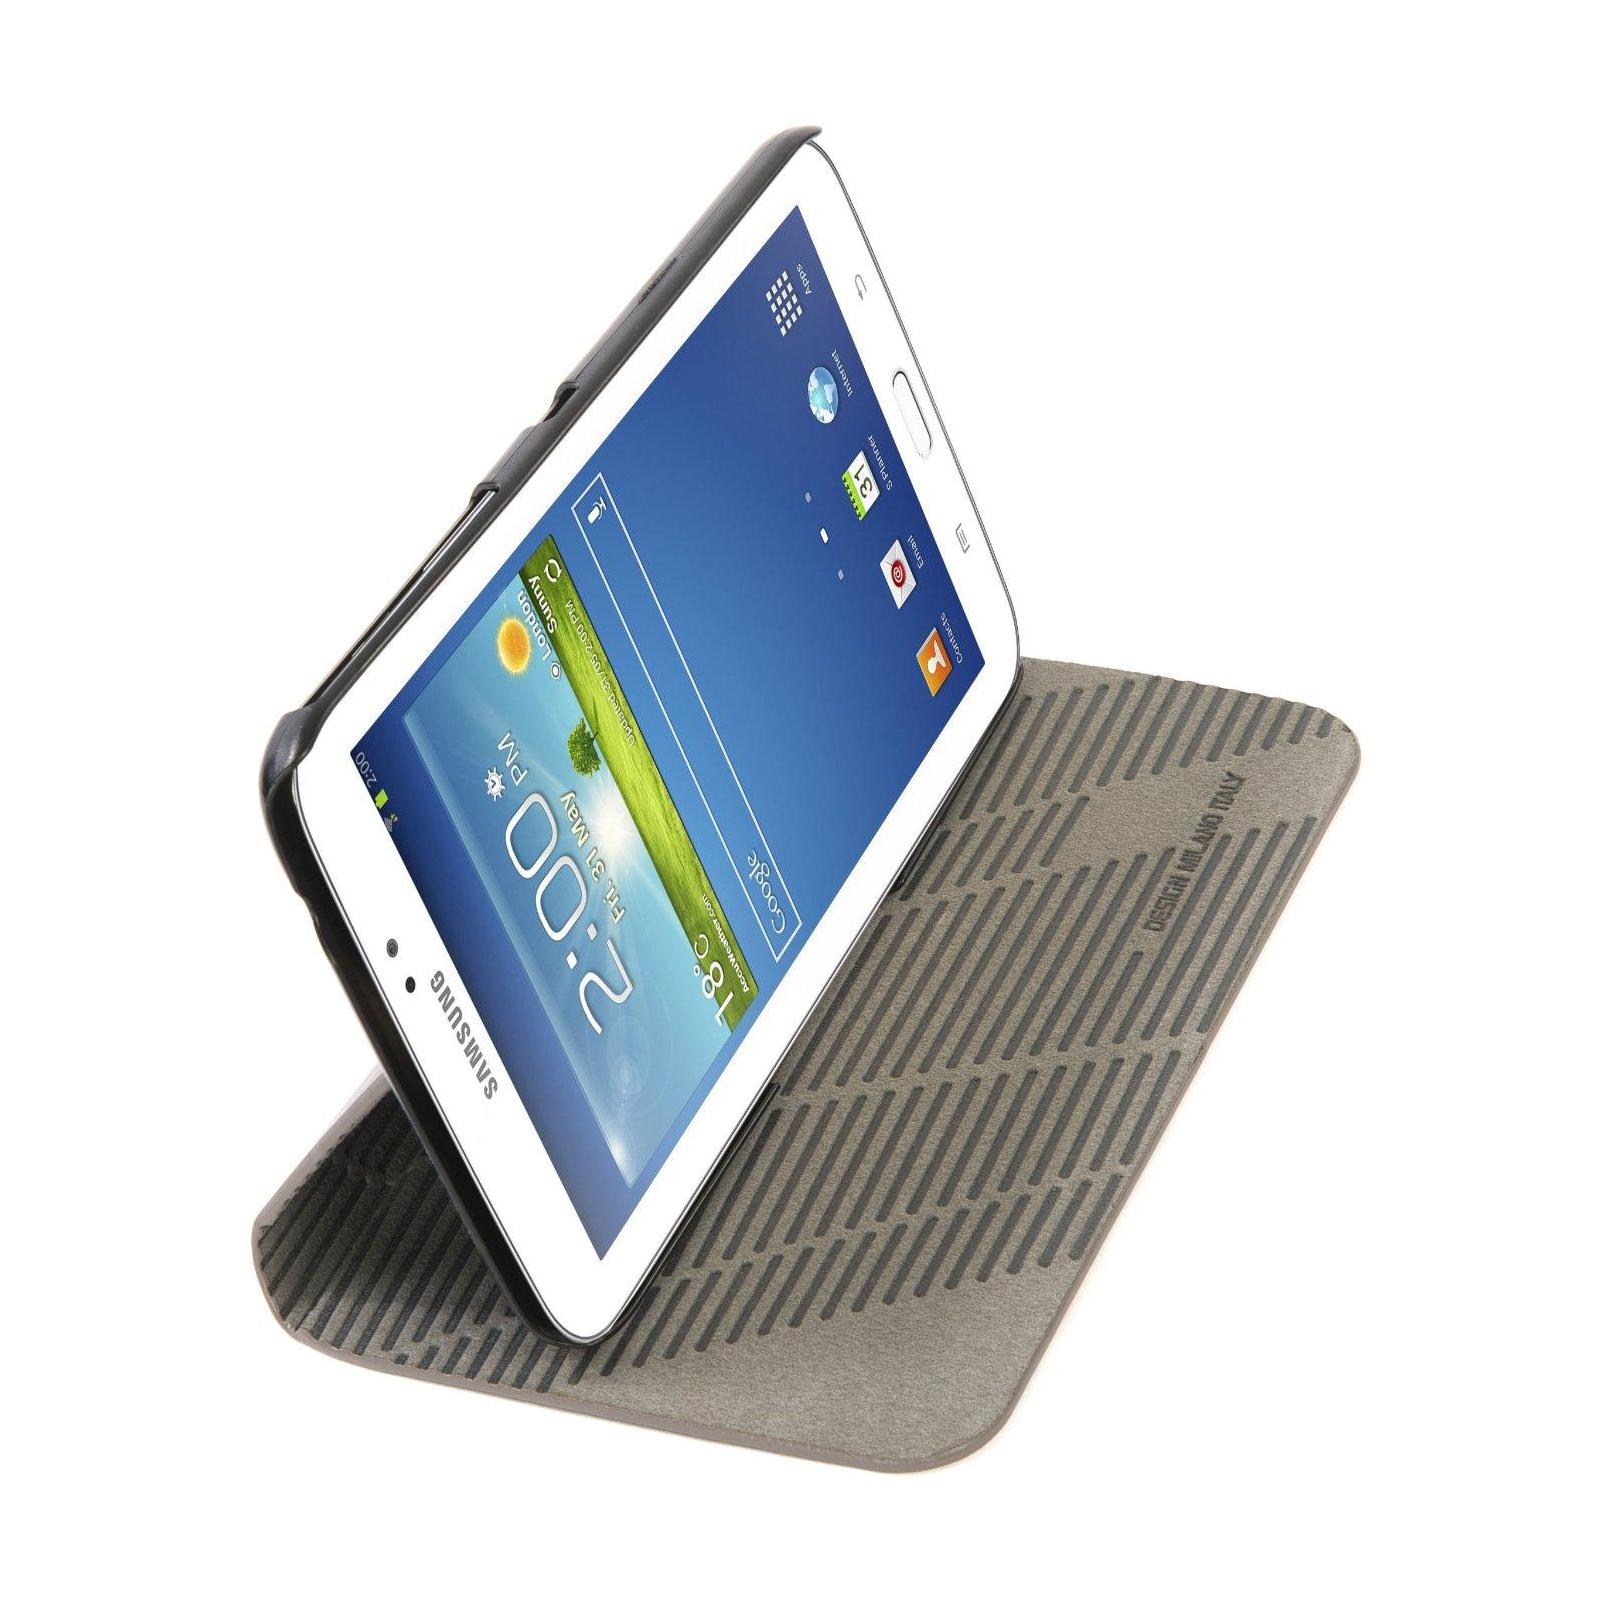 Чехол для планшета Tucano Galaxy Tab3 8.0 Macro (TAB-MS38-G) изображение 4